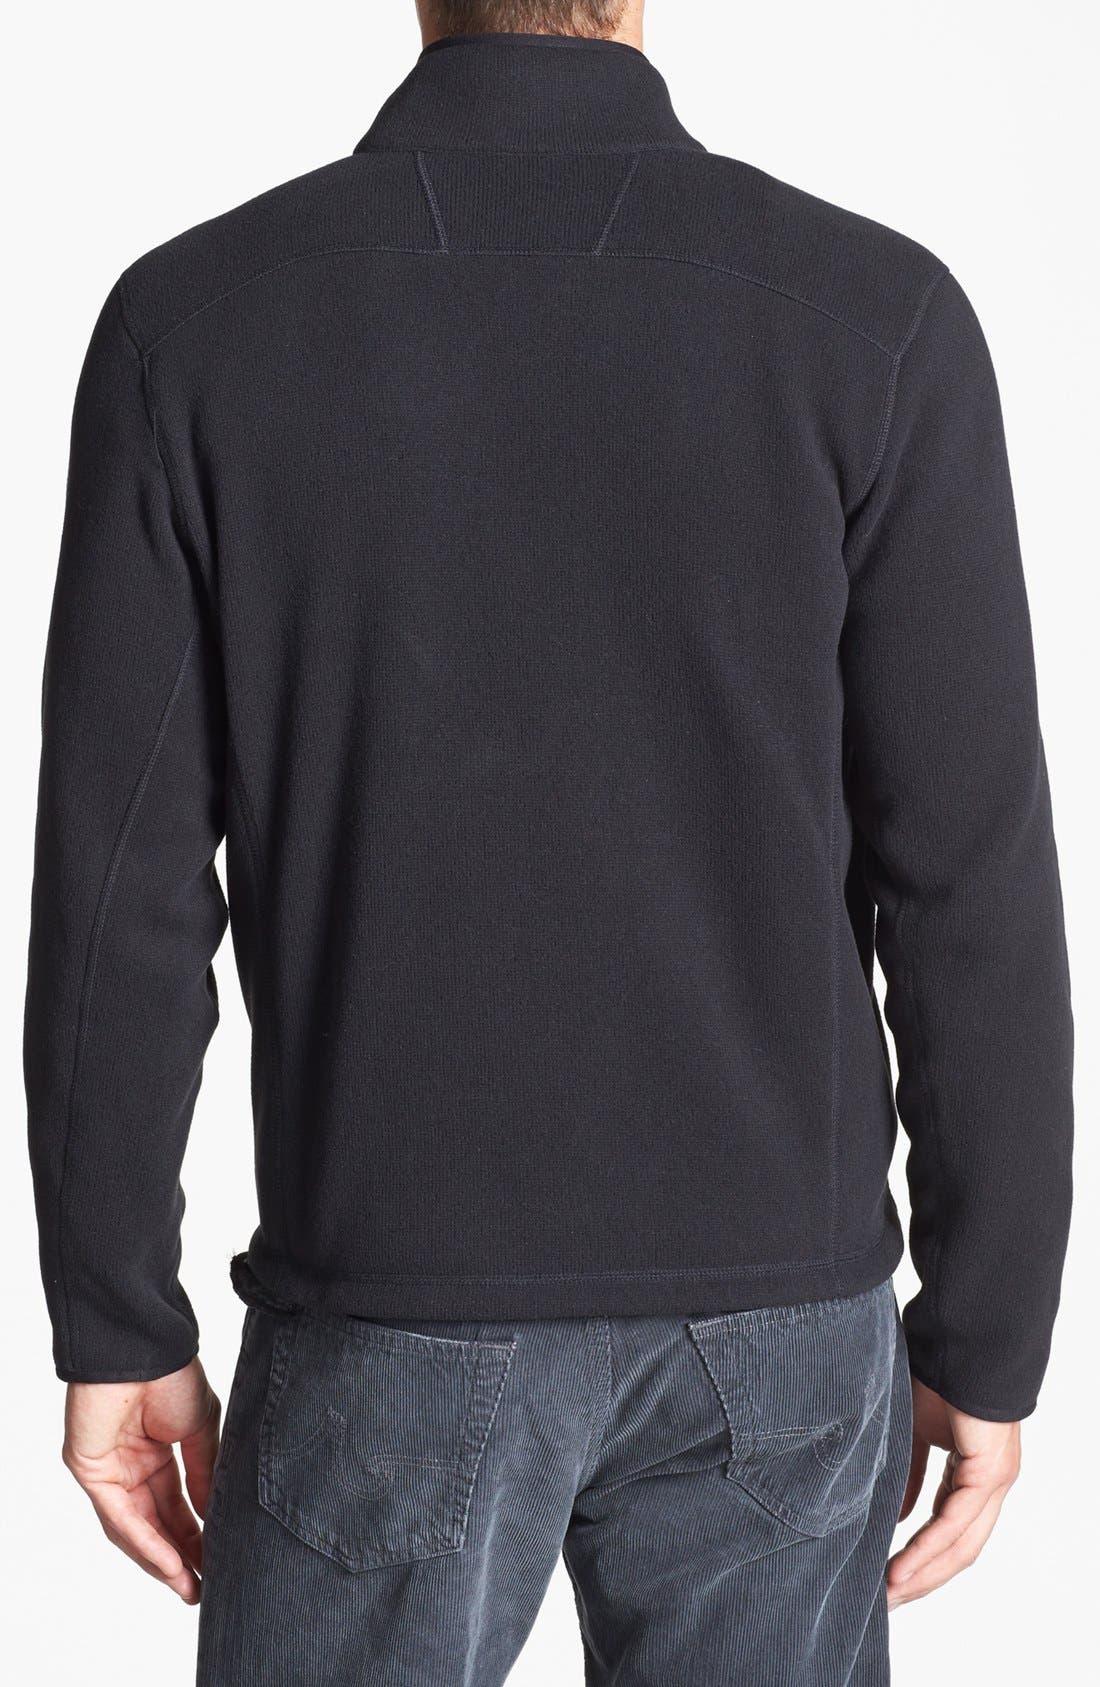 Alternate Image 2  - The North Face 'Gordon Lyons' Sweater Knit Fleece Jacket